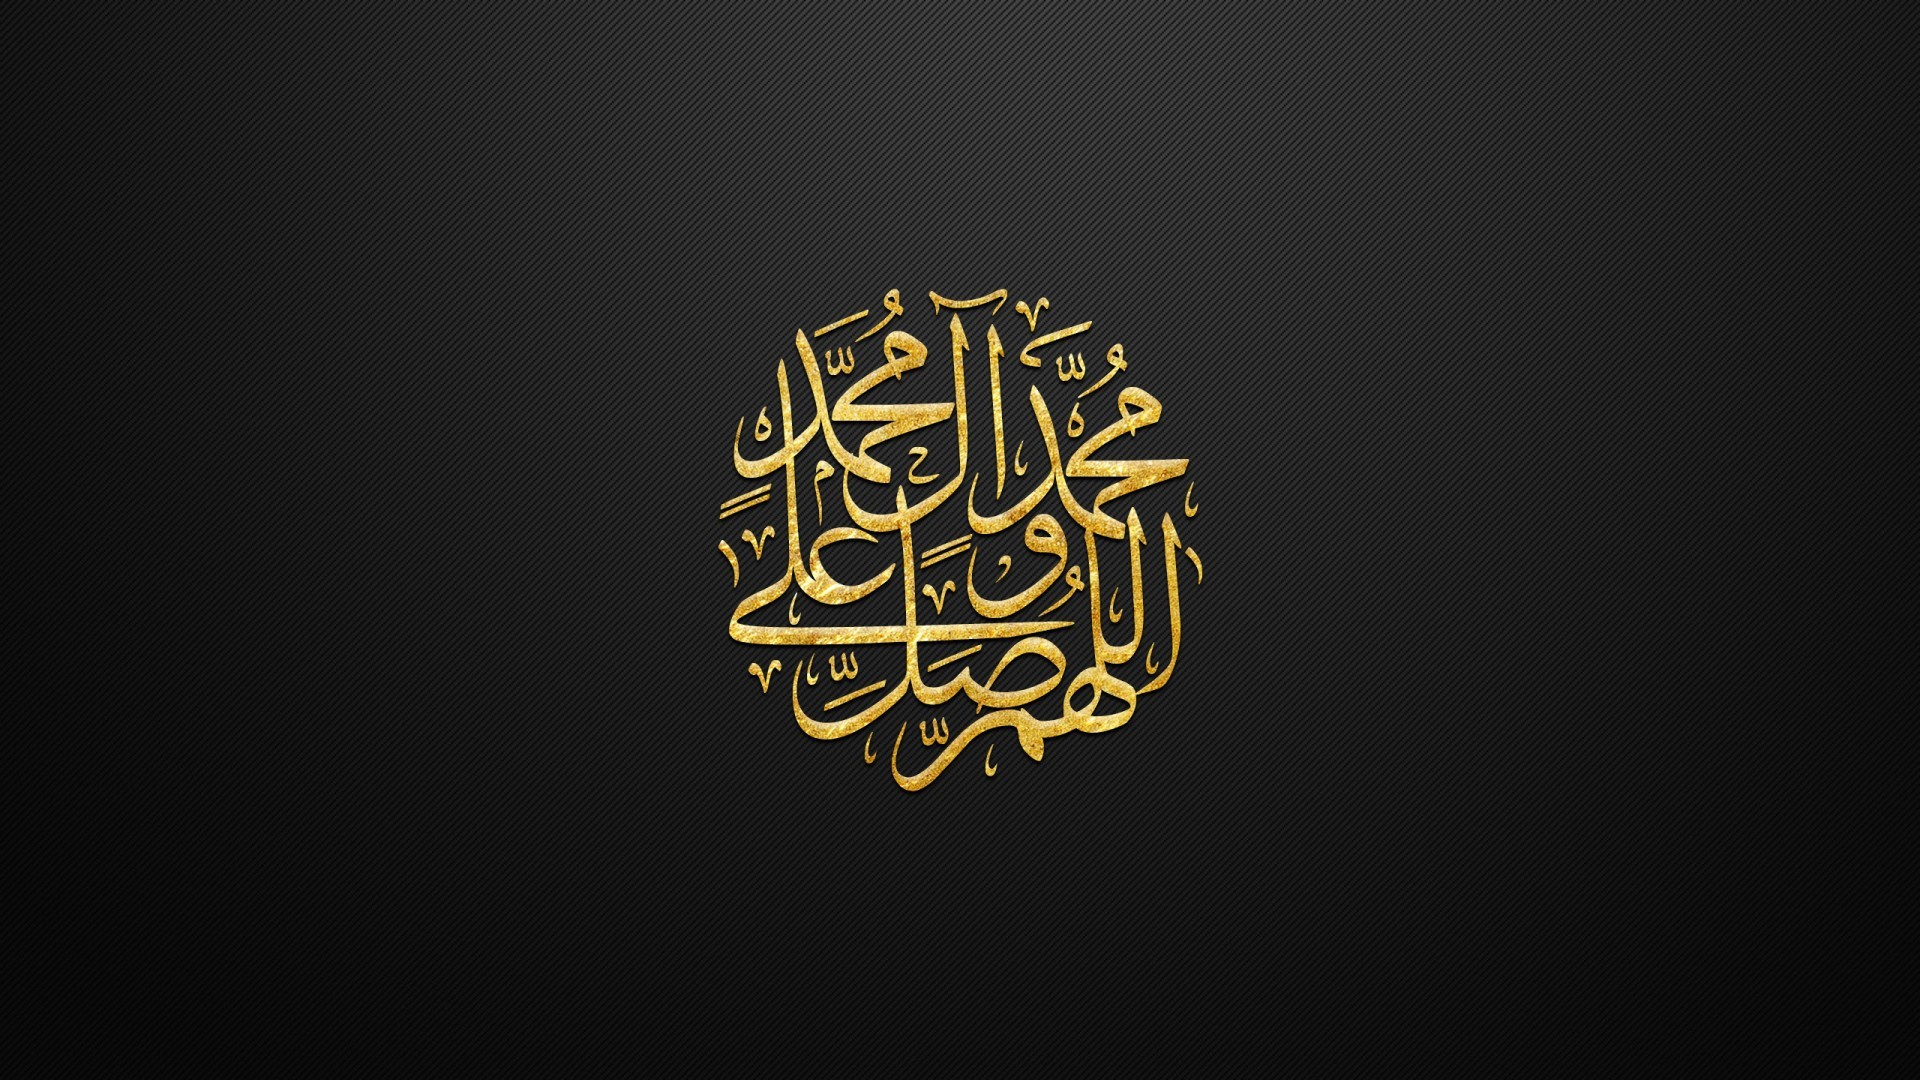 Madina 3d Live Wallpaper Islamic Wallpapers Hd 2018 183 ① Wallpapertag